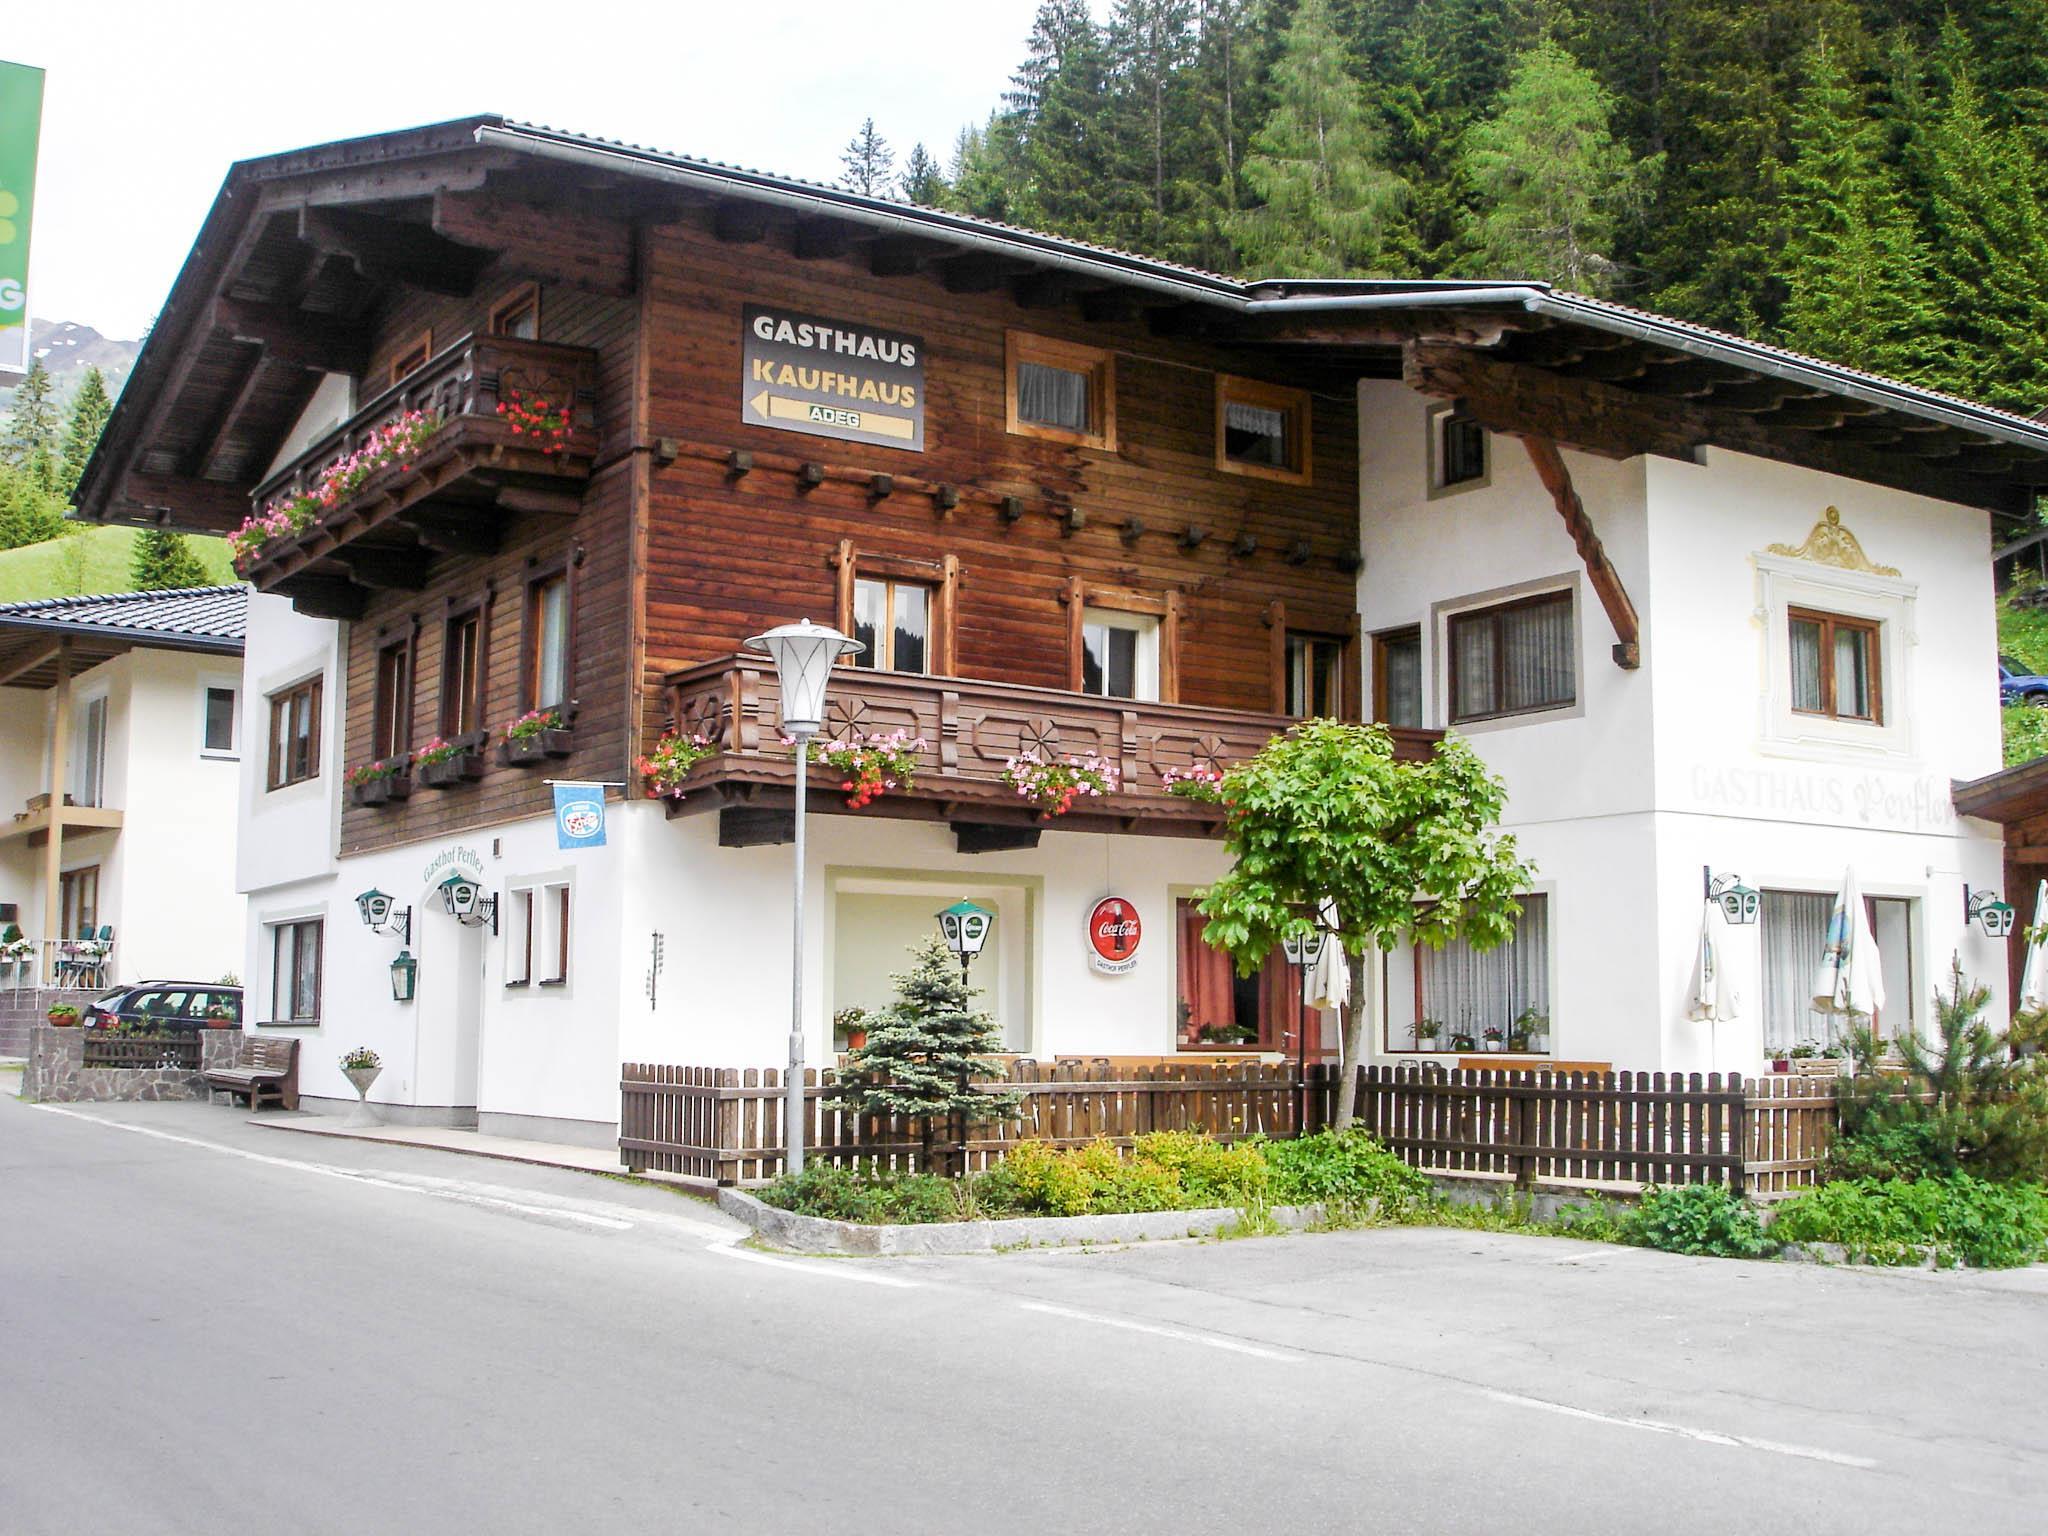 Gasthaus-Perfler.jpg